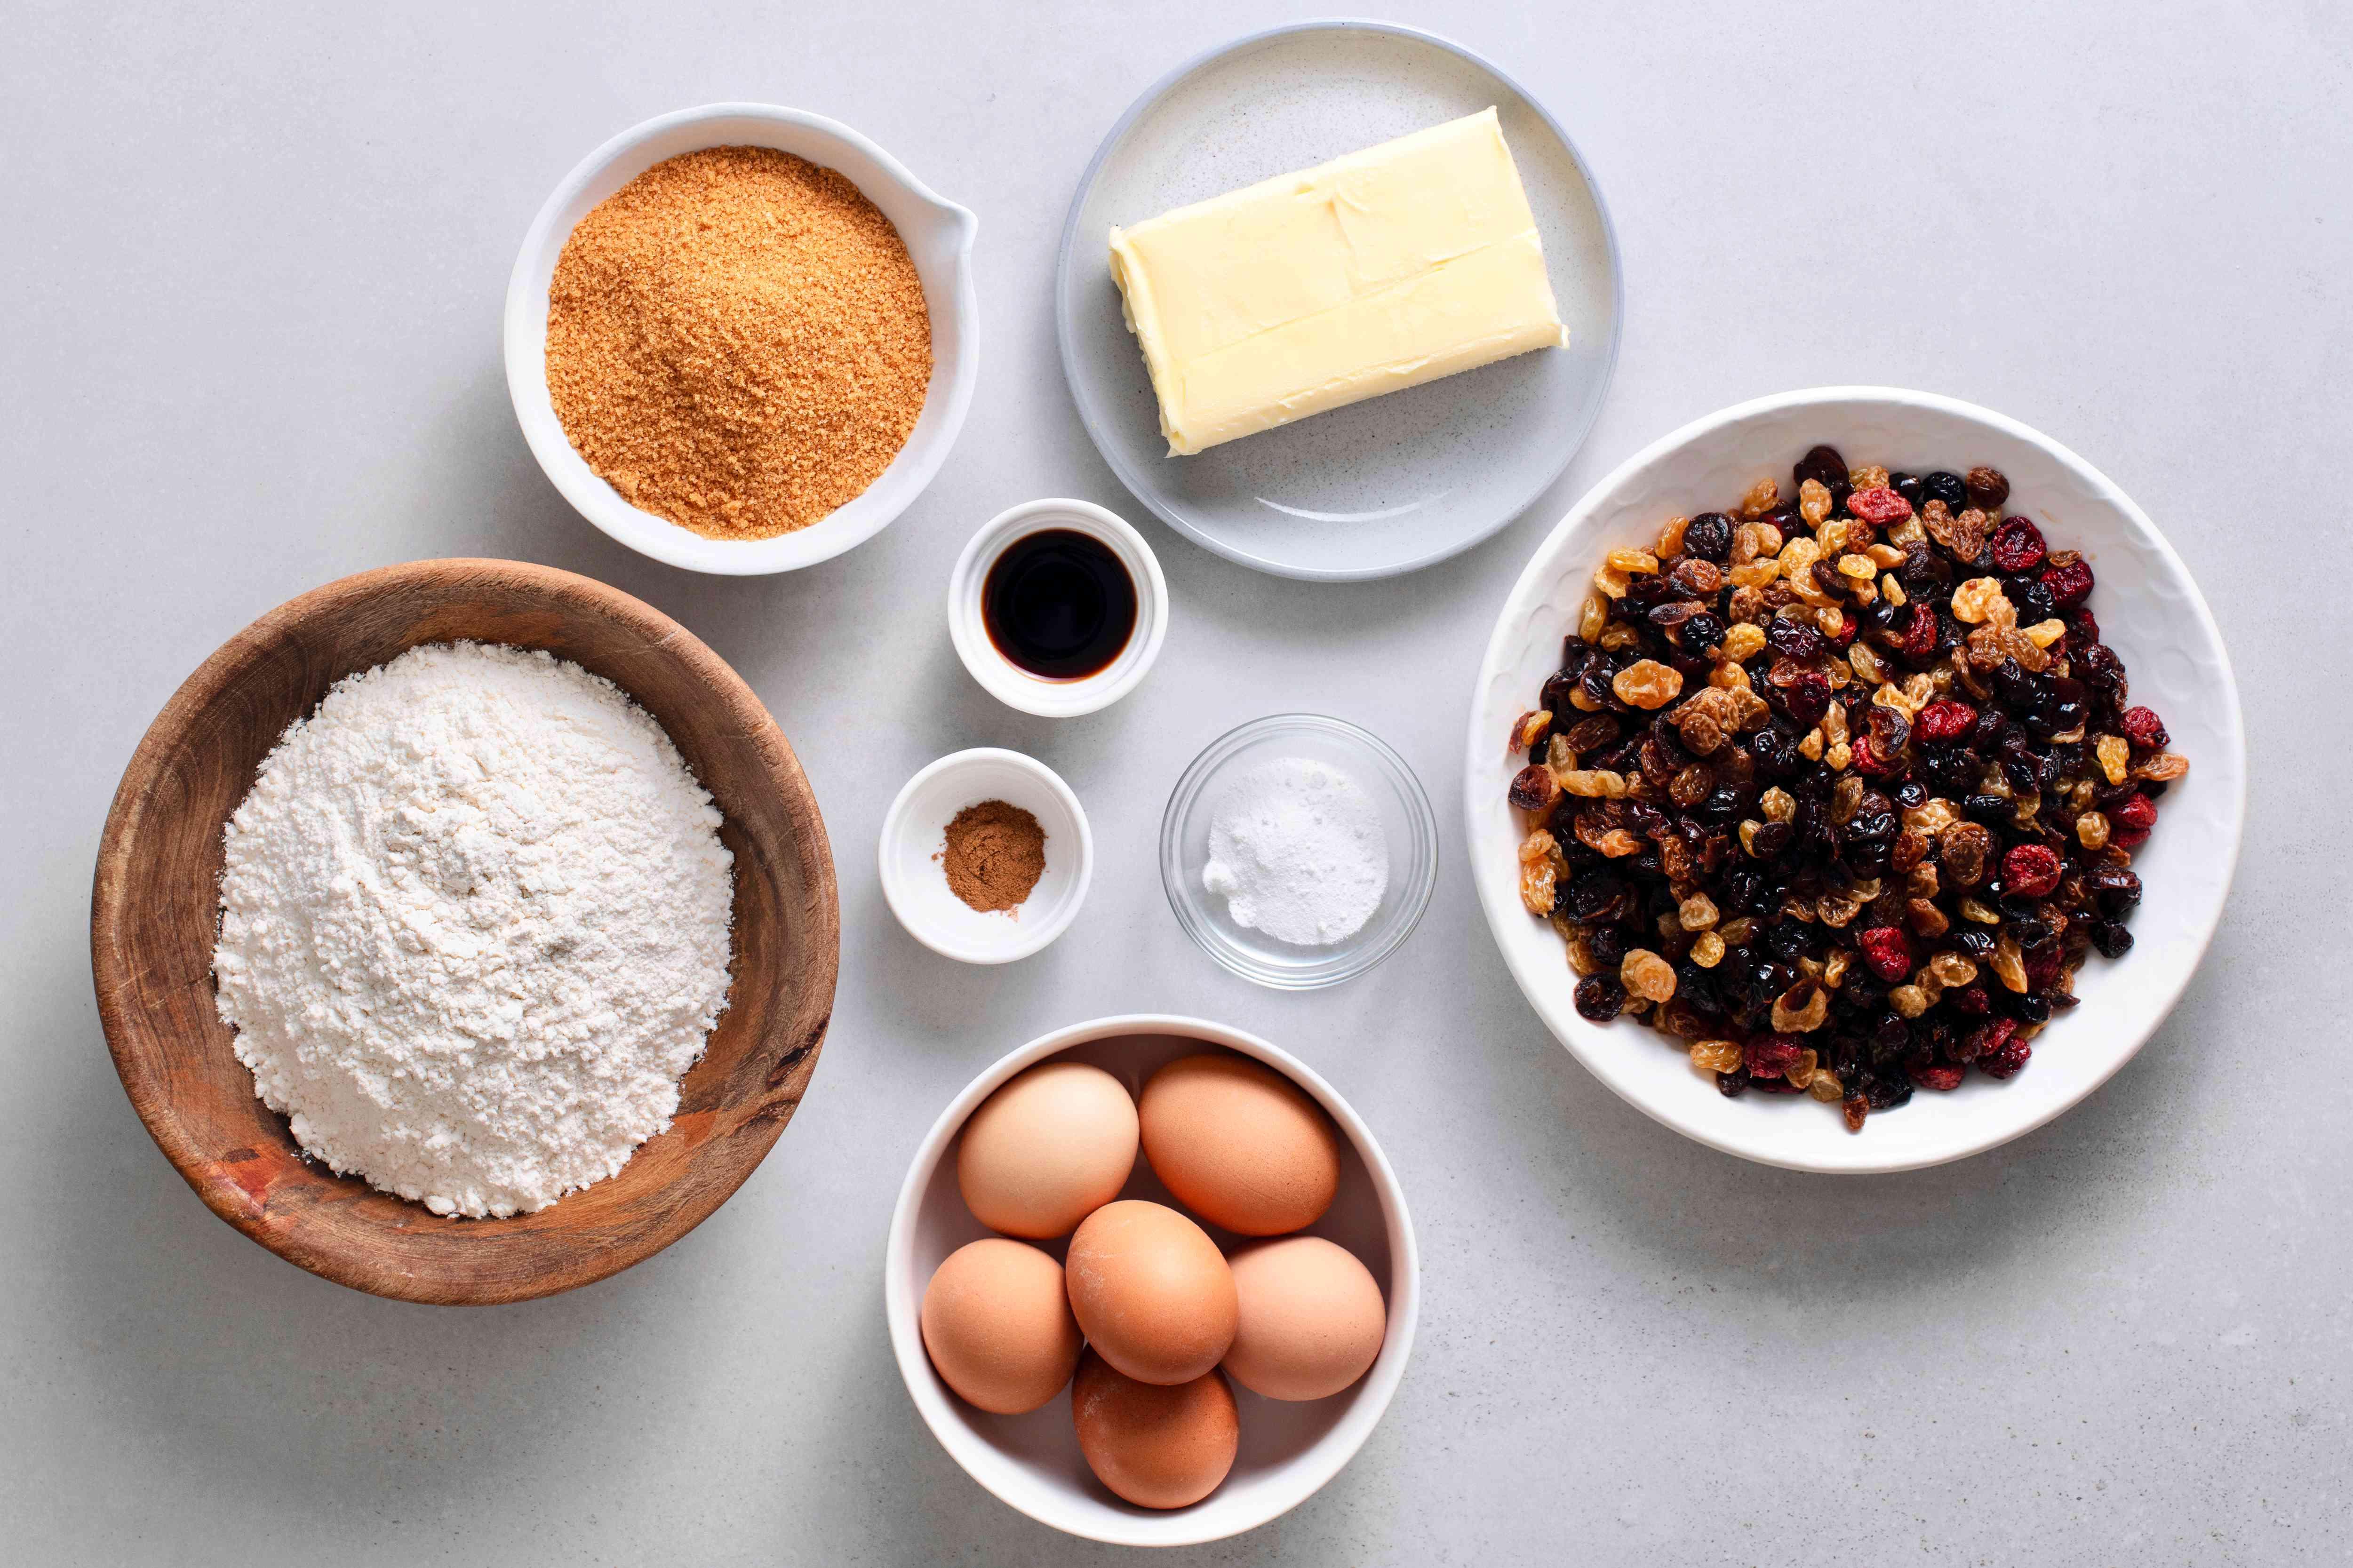 Christmas cake ingredients